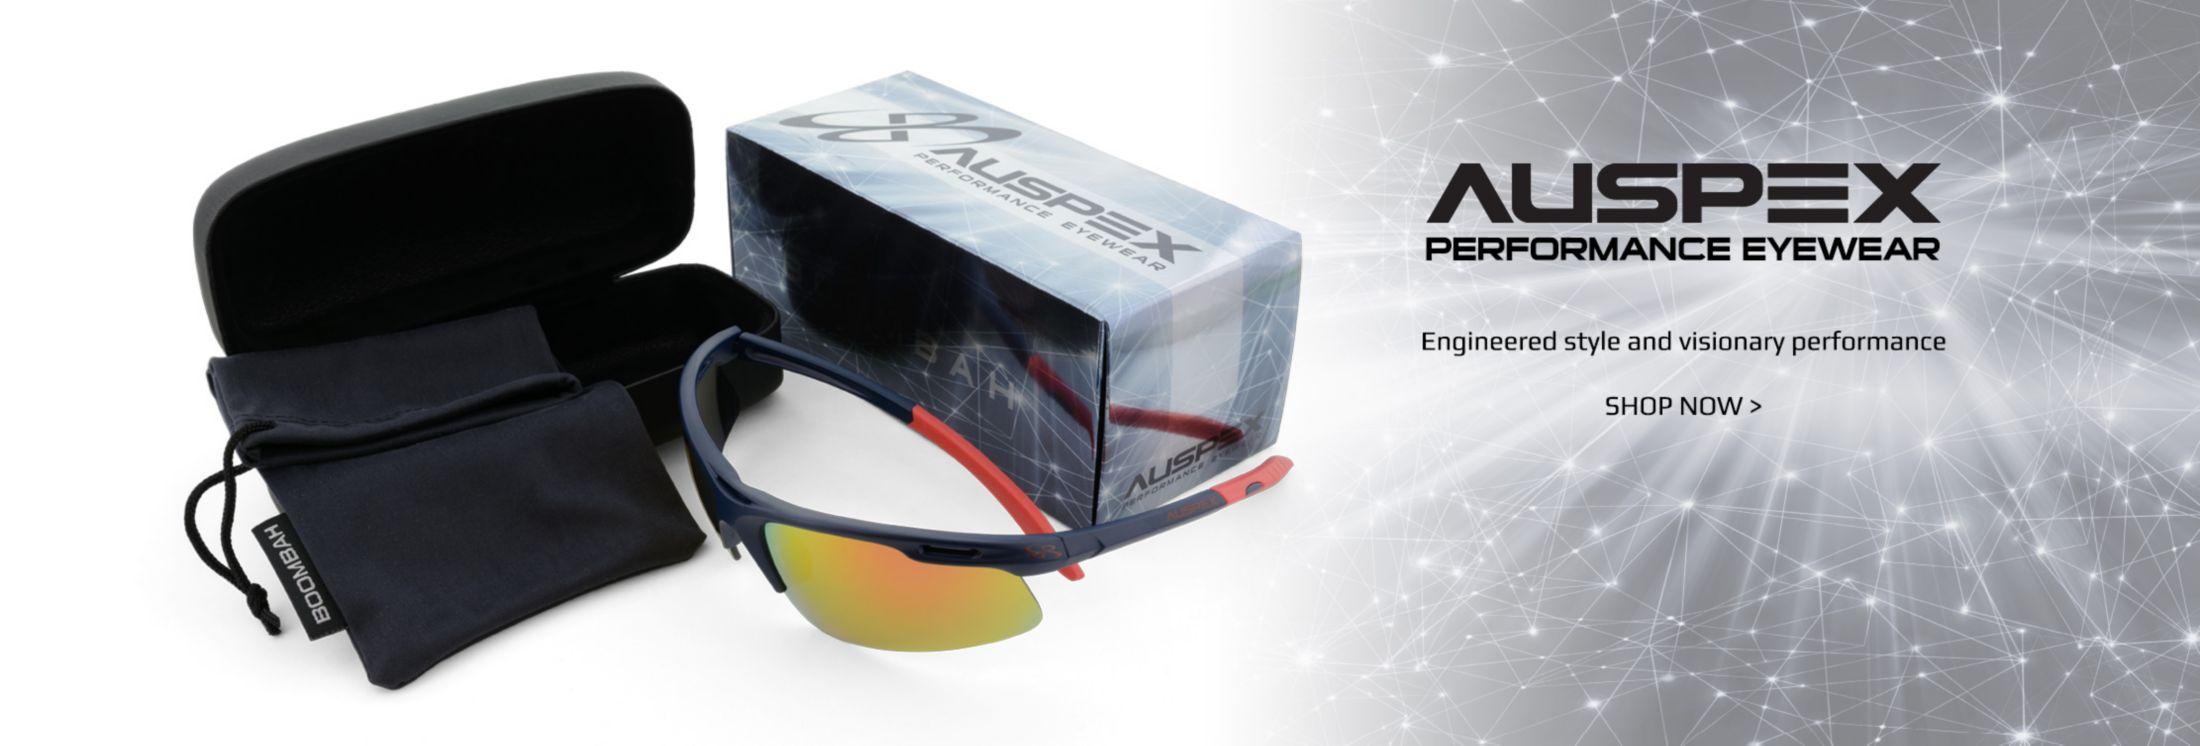 Boombah Auspex Performance Eyewear